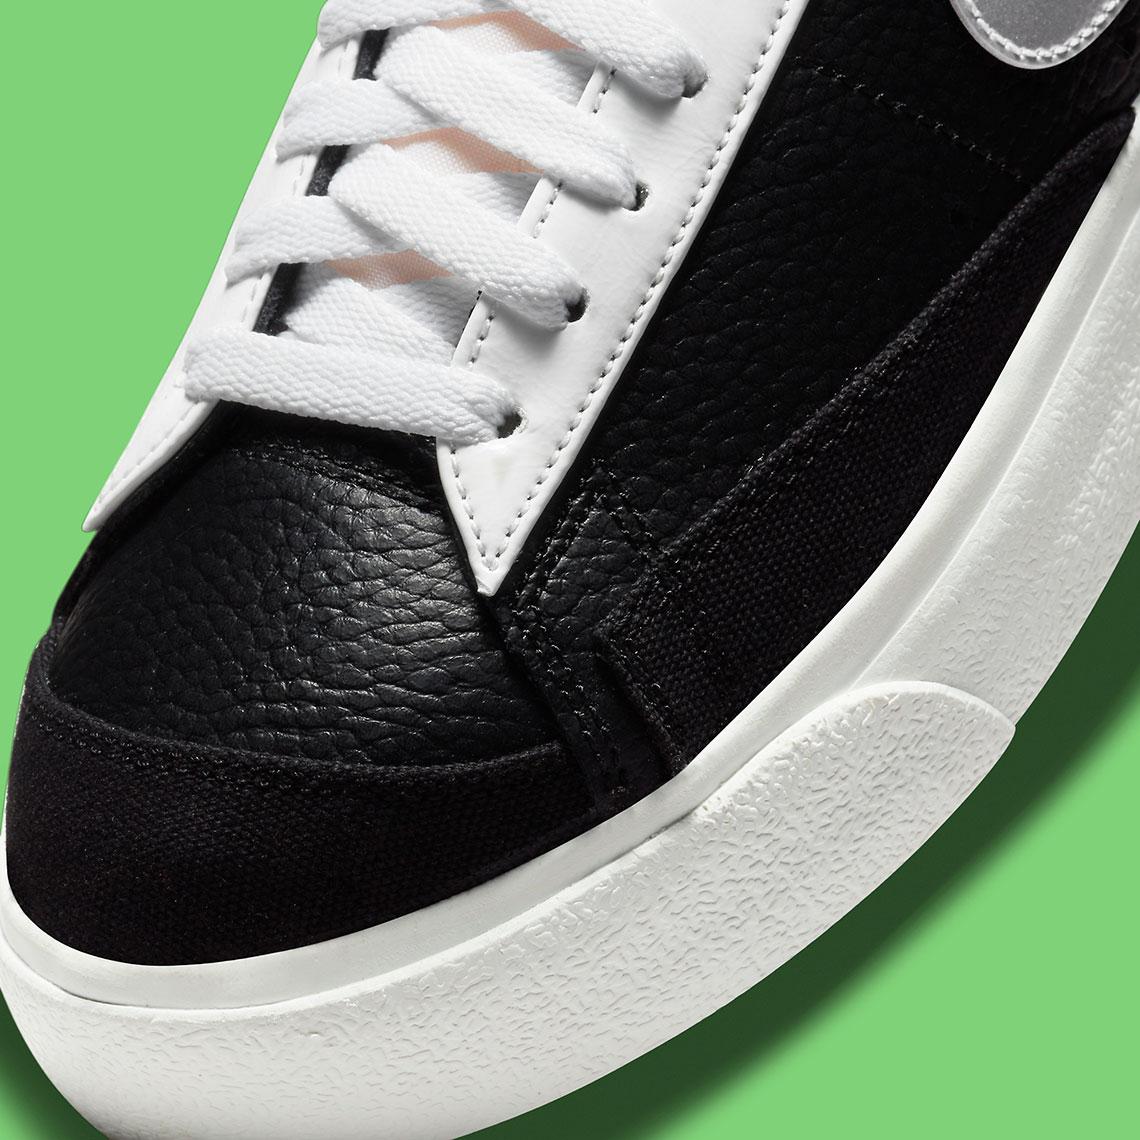 nike blazer low black silver metallic green dn8010 001 4